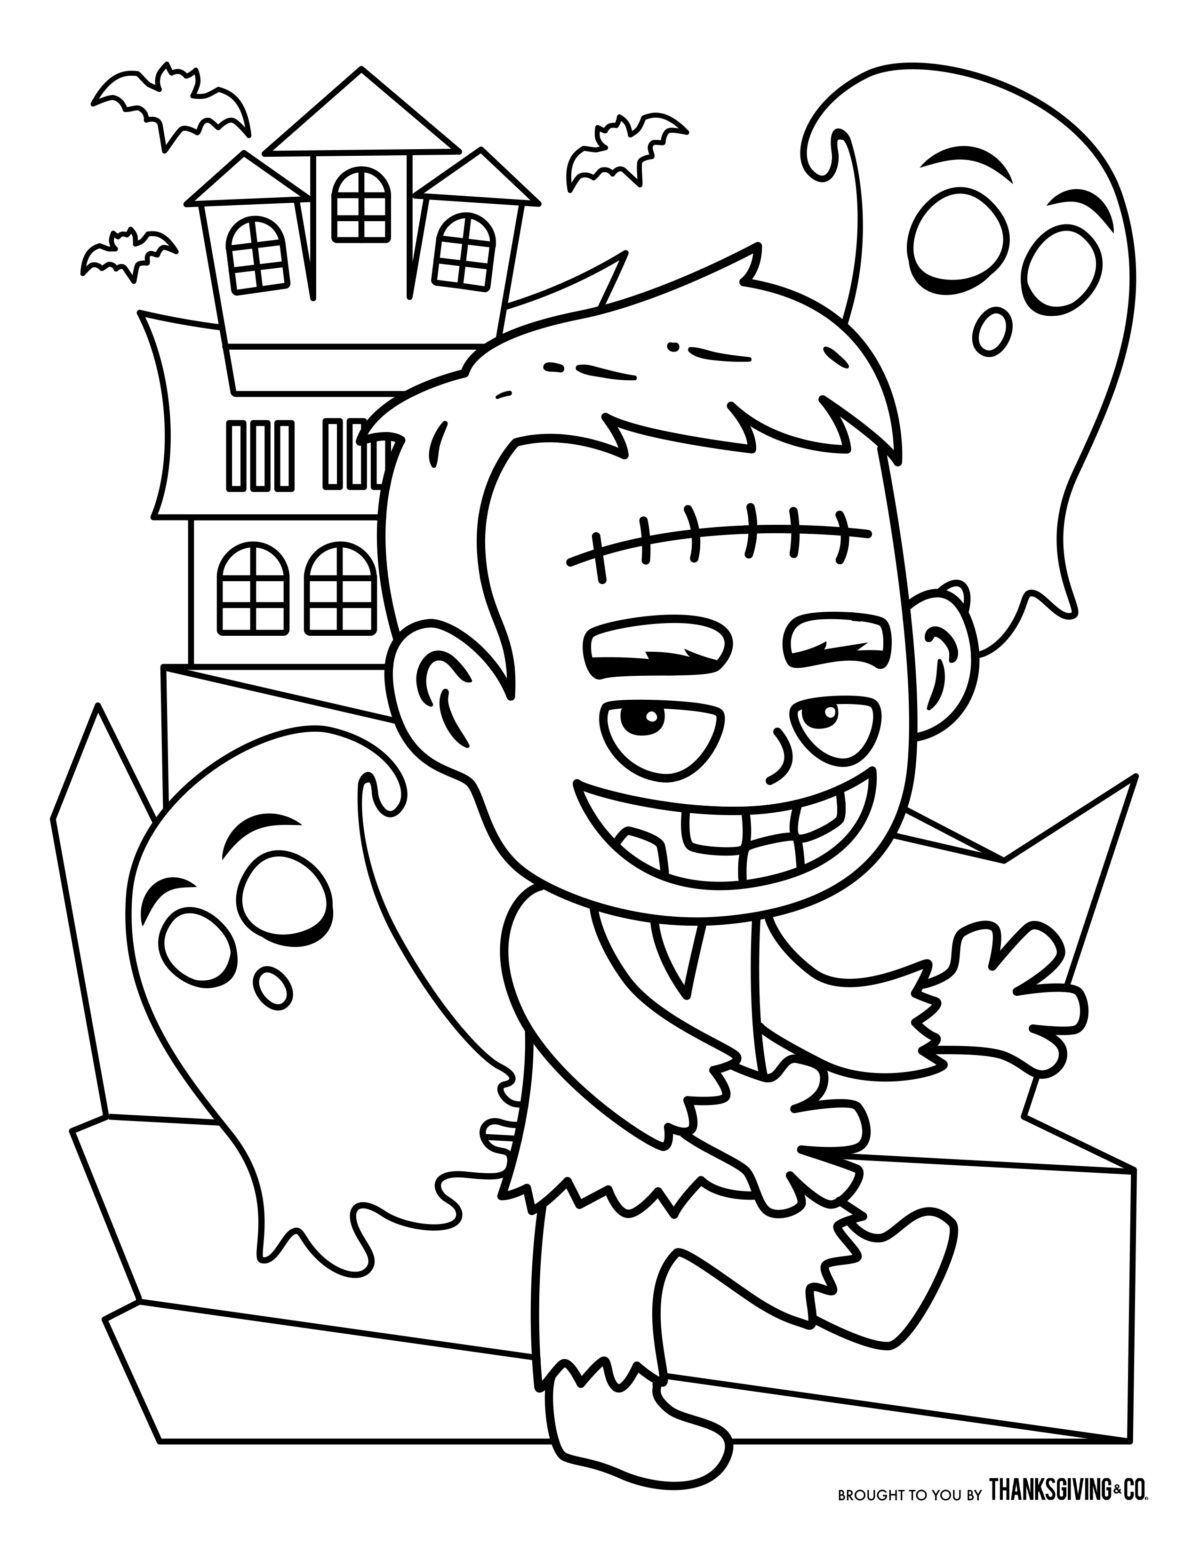 Halloween Coloring Page Kid Free Halloween Coloring Pages For Kids Or In 2020 Free Halloween Coloring Pages Halloween Coloring Pages Printable Halloween Coloring Pages